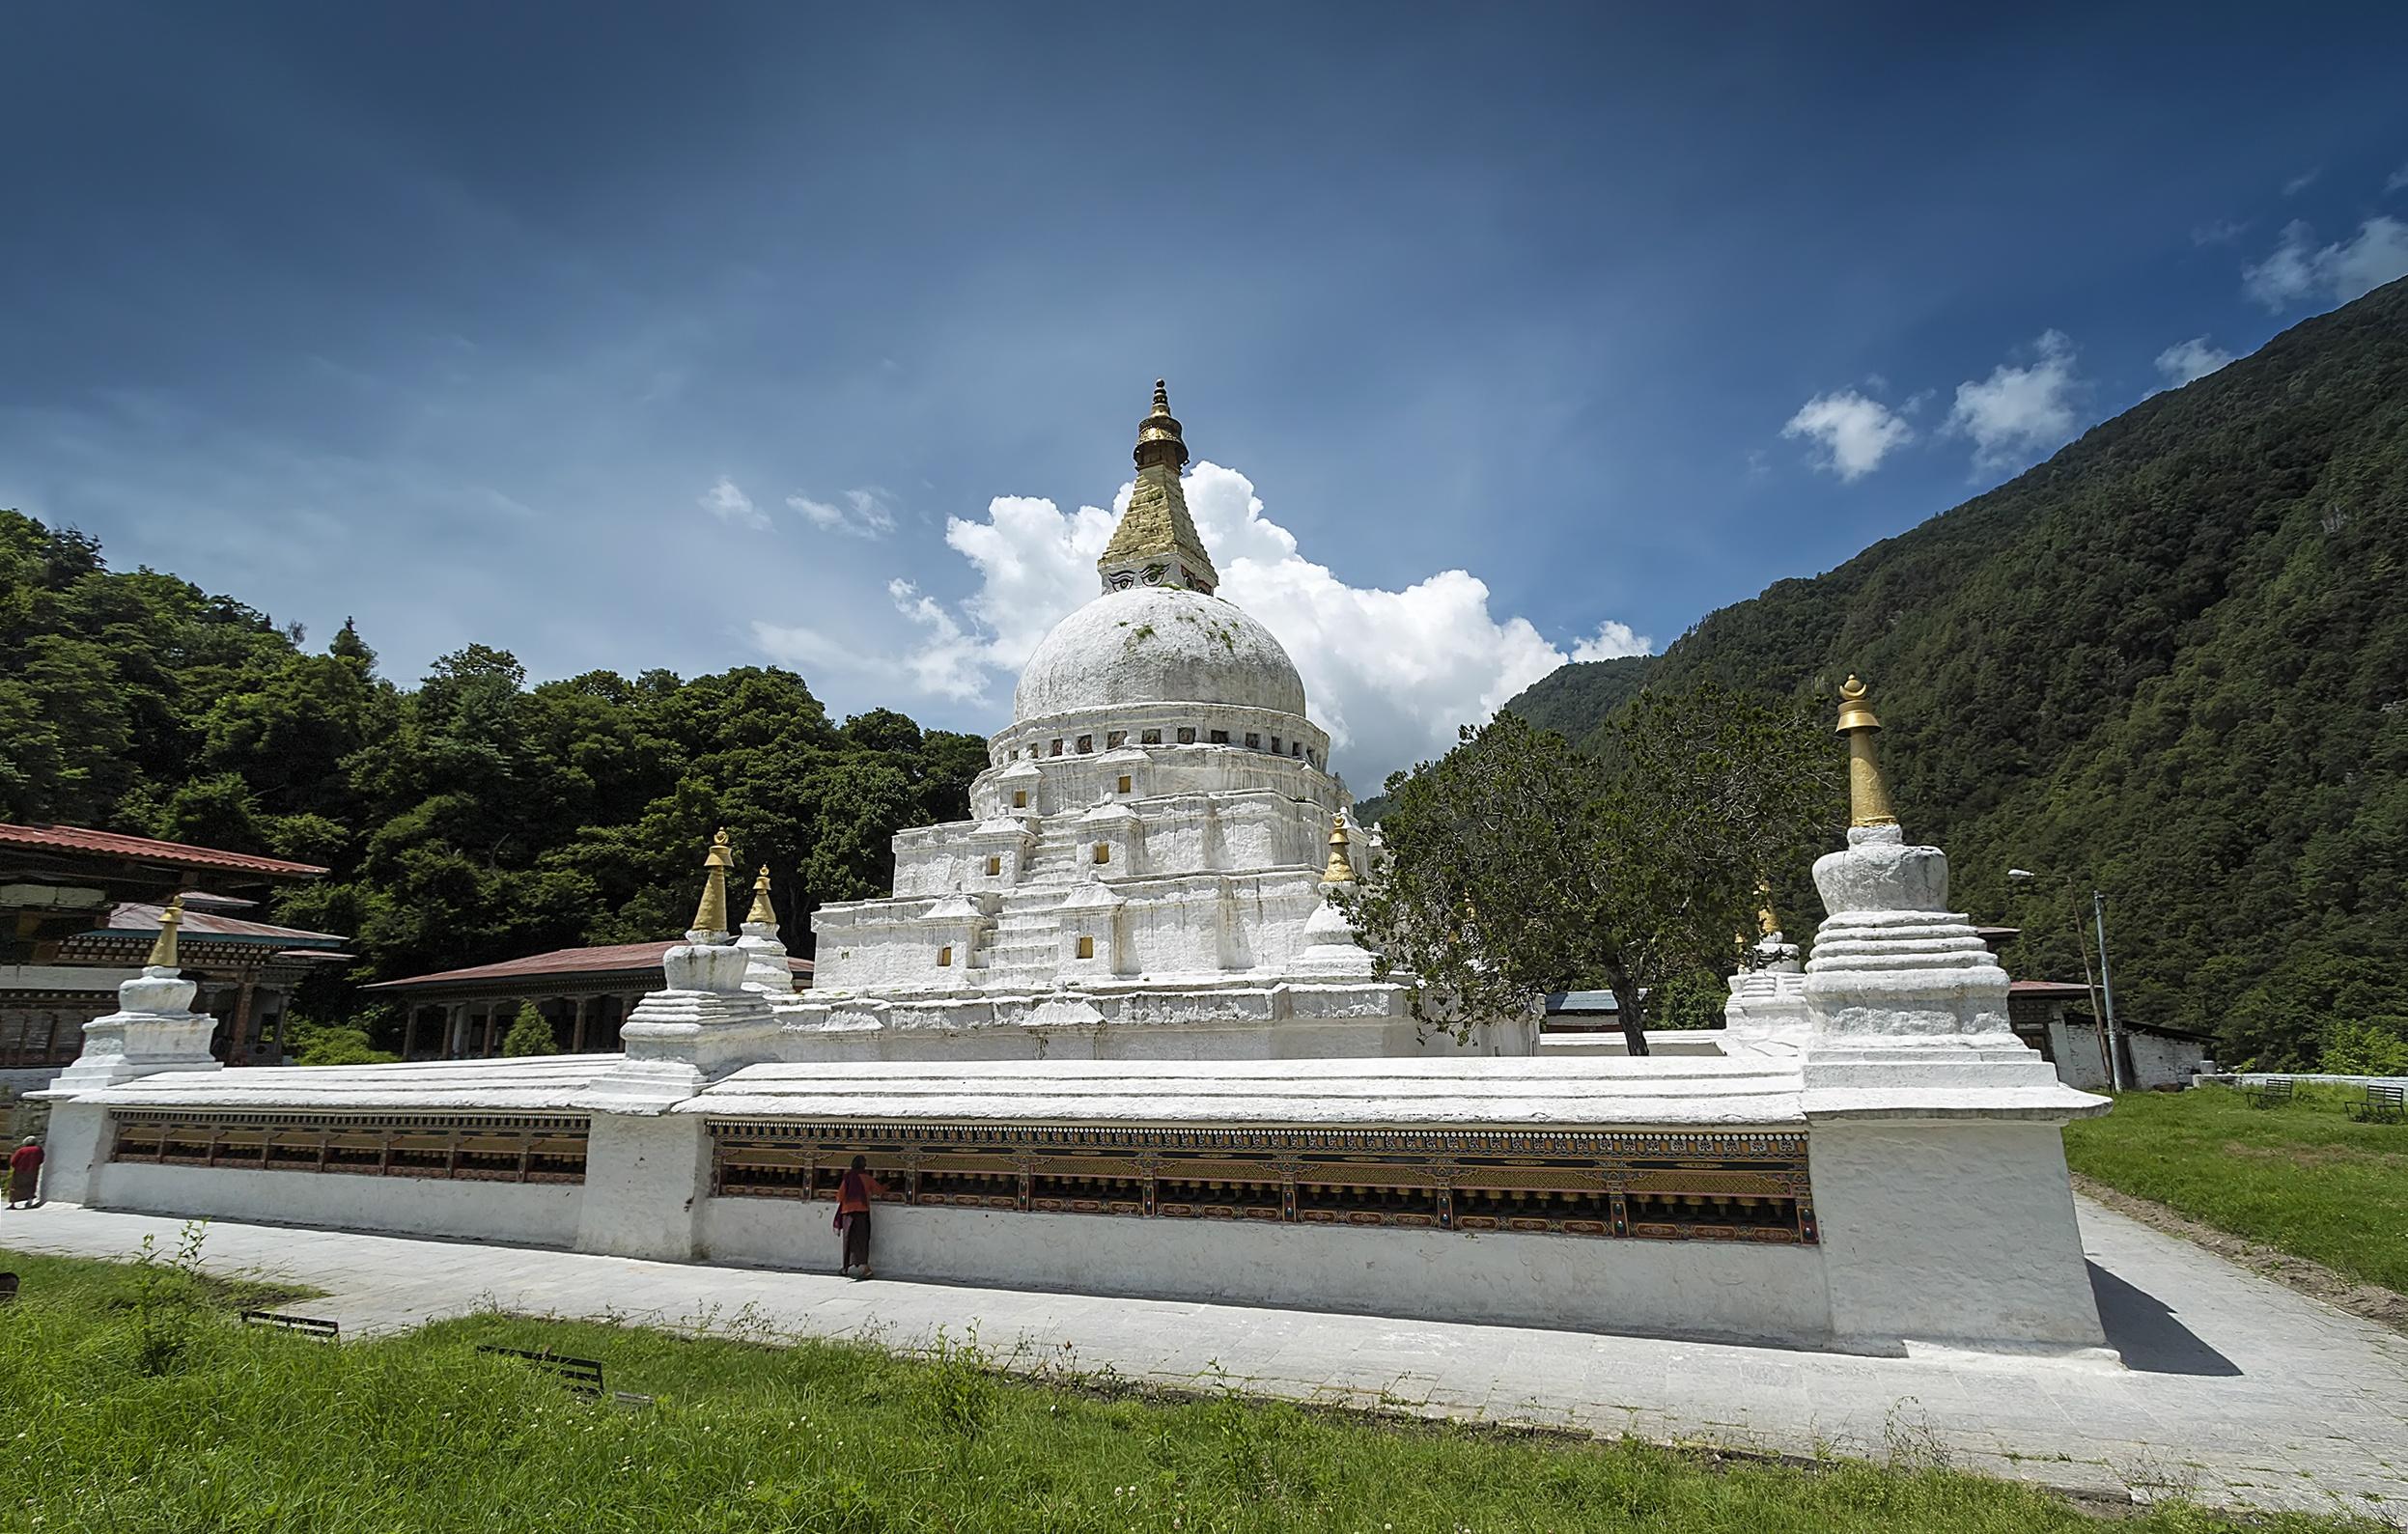 Chorten_Kora,_Trashiyangtse_District,_Bhutan